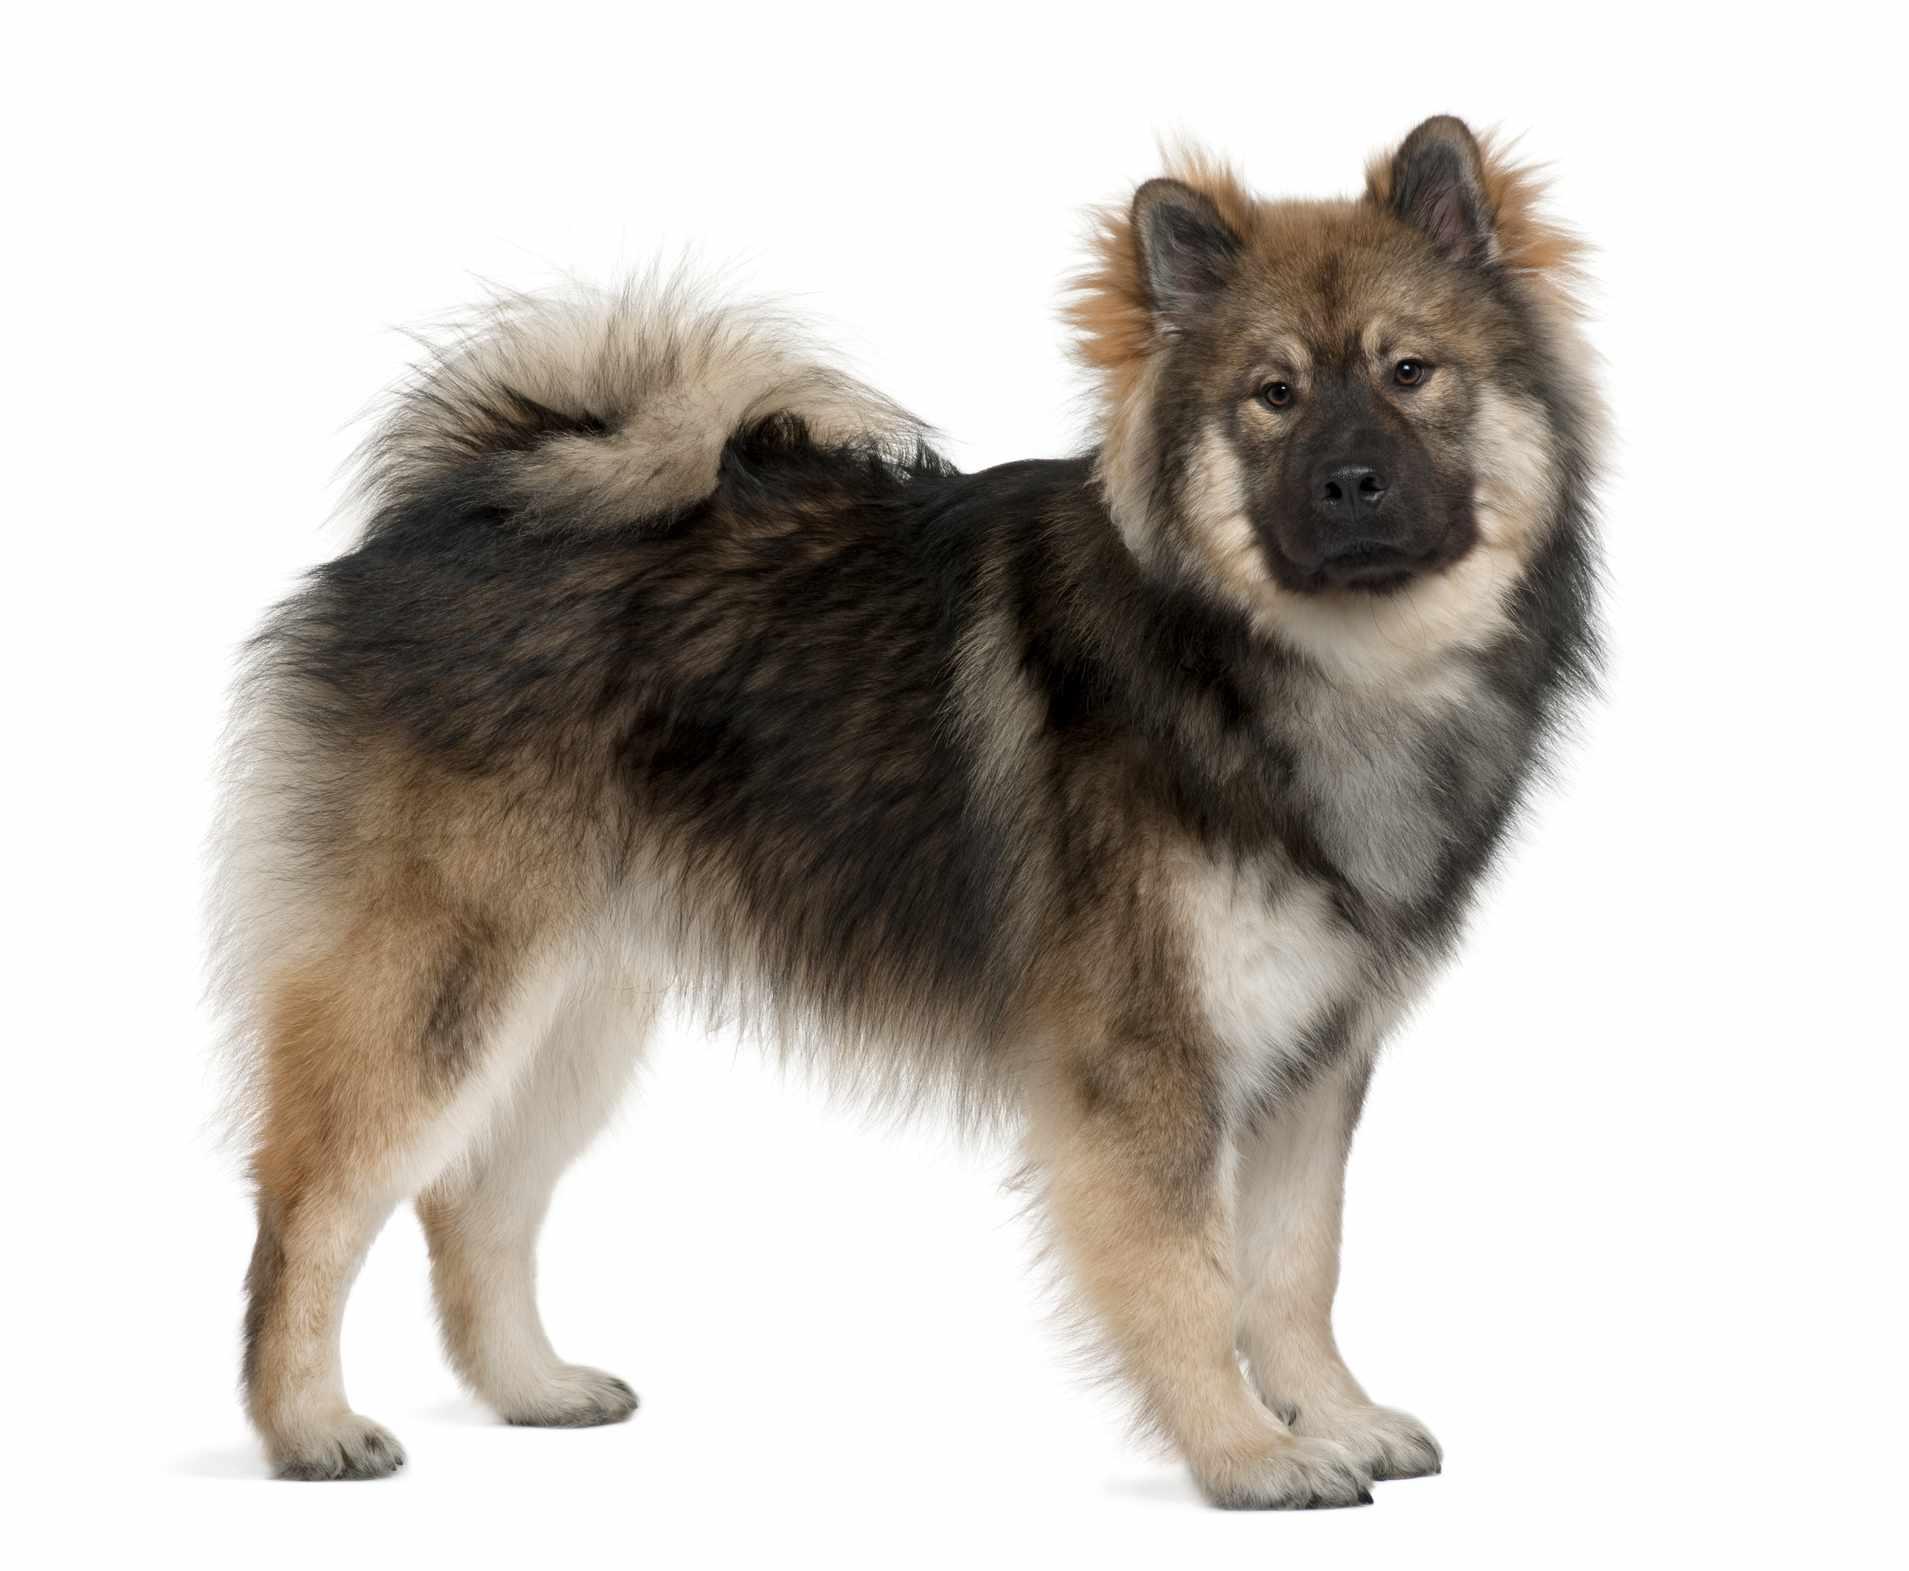 Adult Eurasier dog